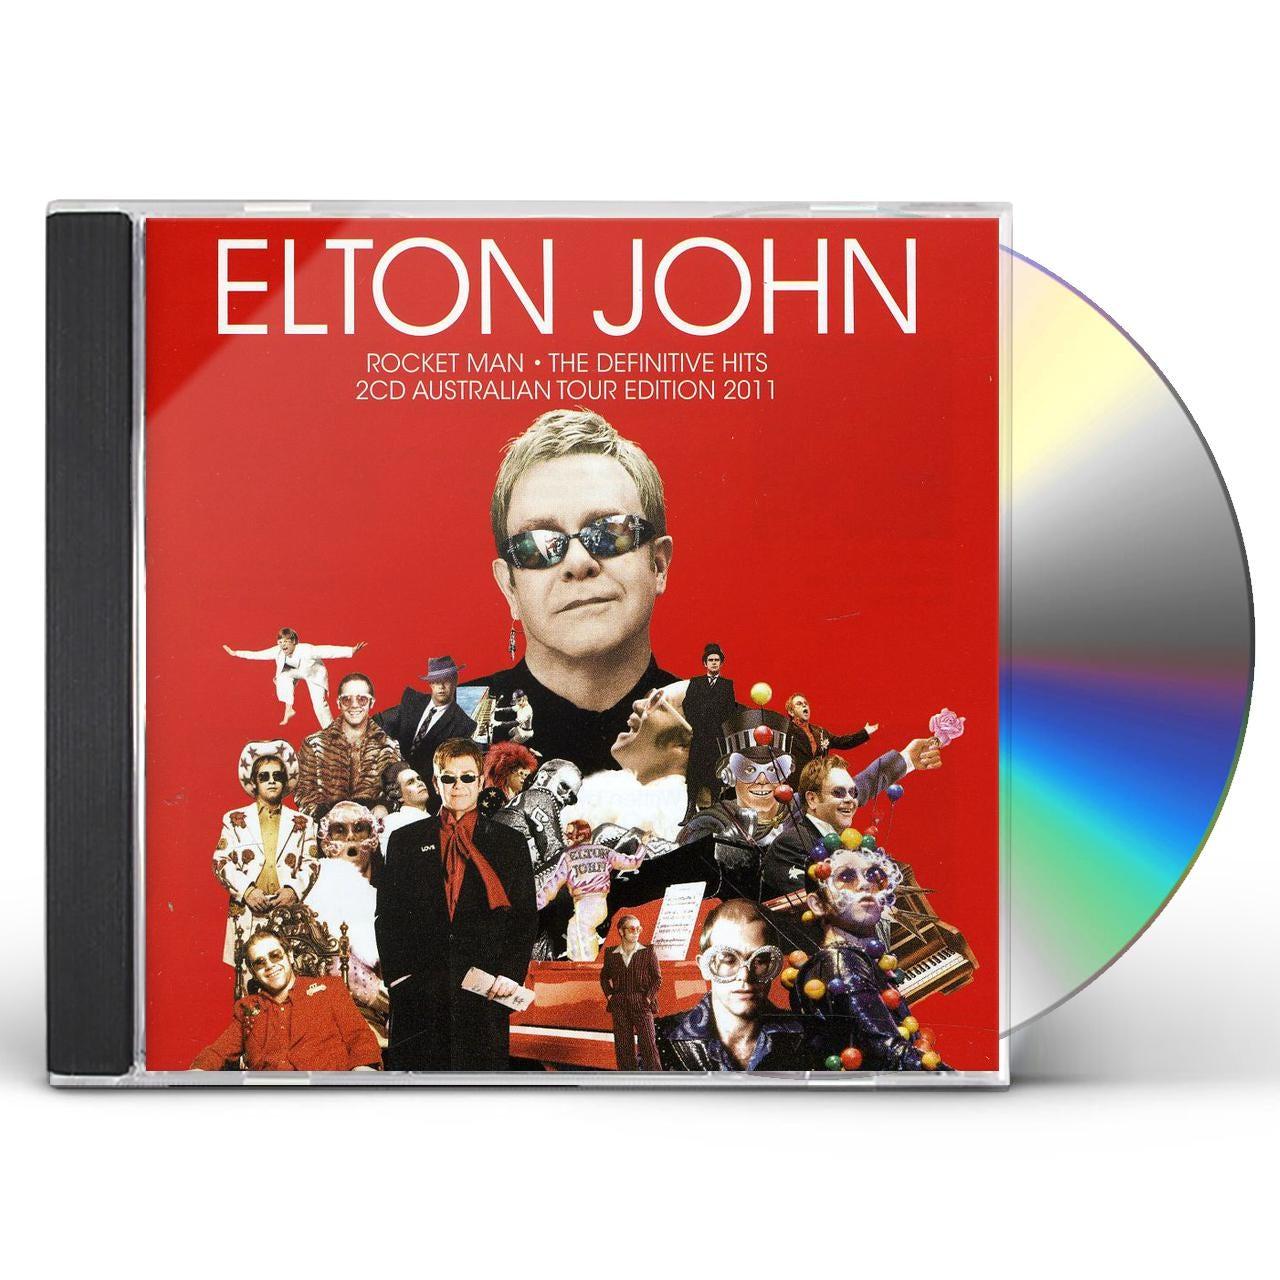 Elton John Rocket Man Definitive Hits Cd